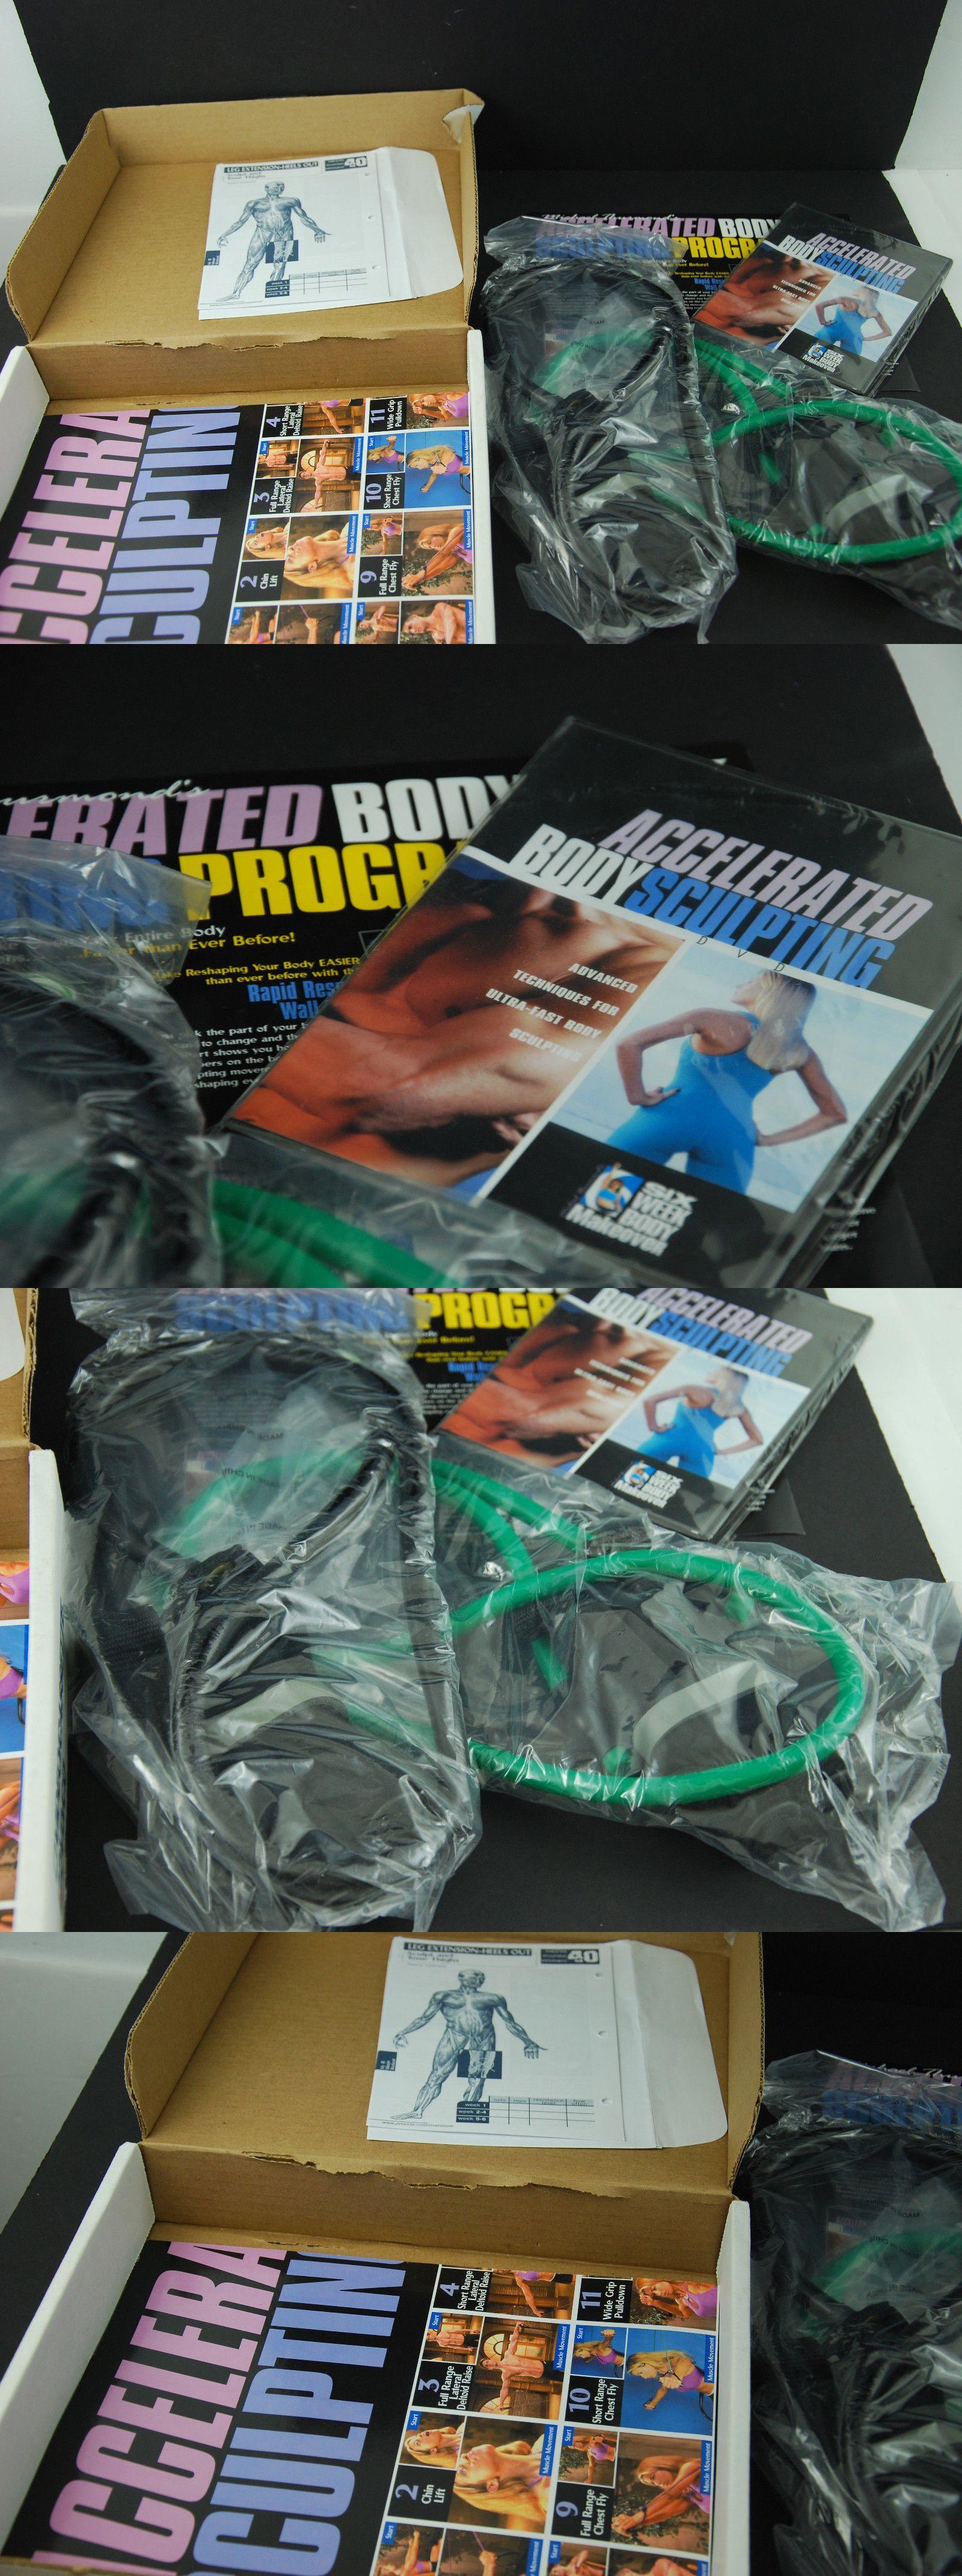 Fitness DVDs 109130 Michael Thurmond S Six 6 Week Body Makeover Weight Loss Dvd Program Provida Set...